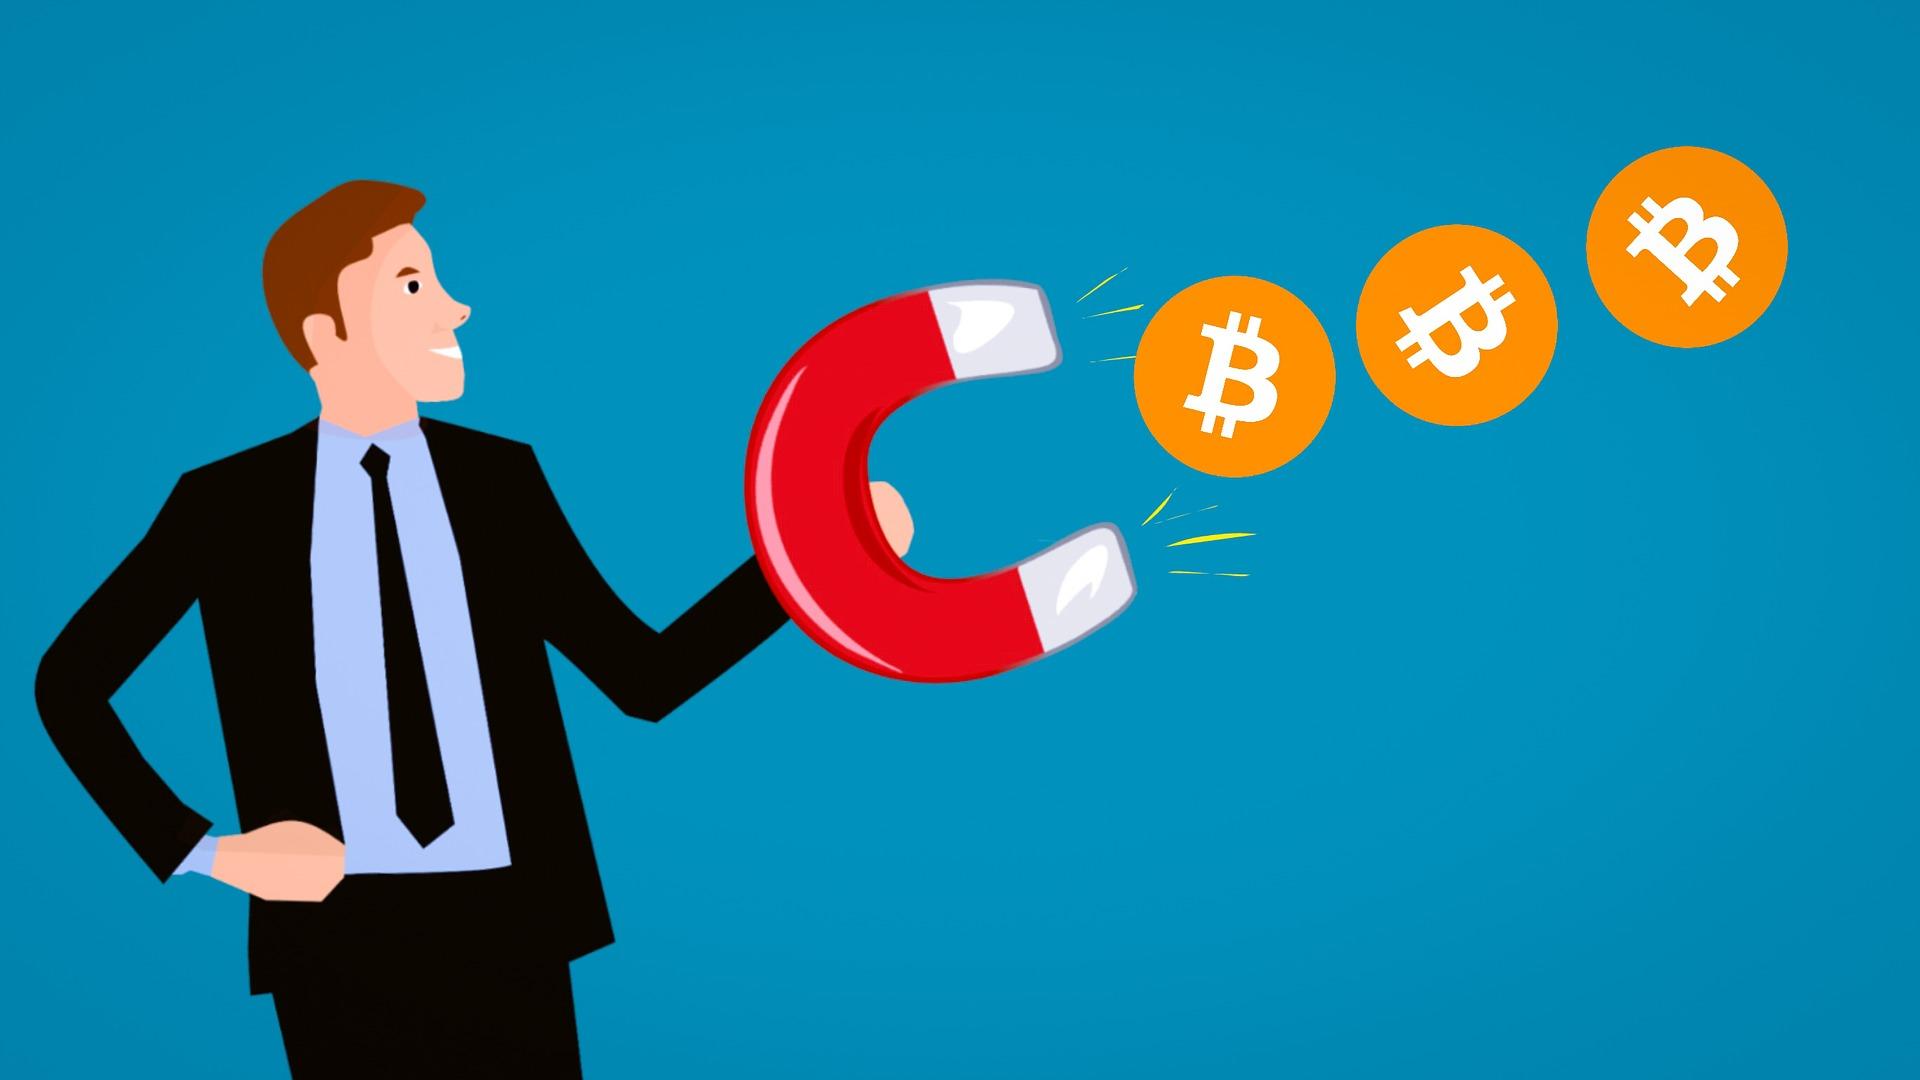 Post cryptum — другий pre-sale TON, кредит під заставу криптовалют, продаж Poloniex